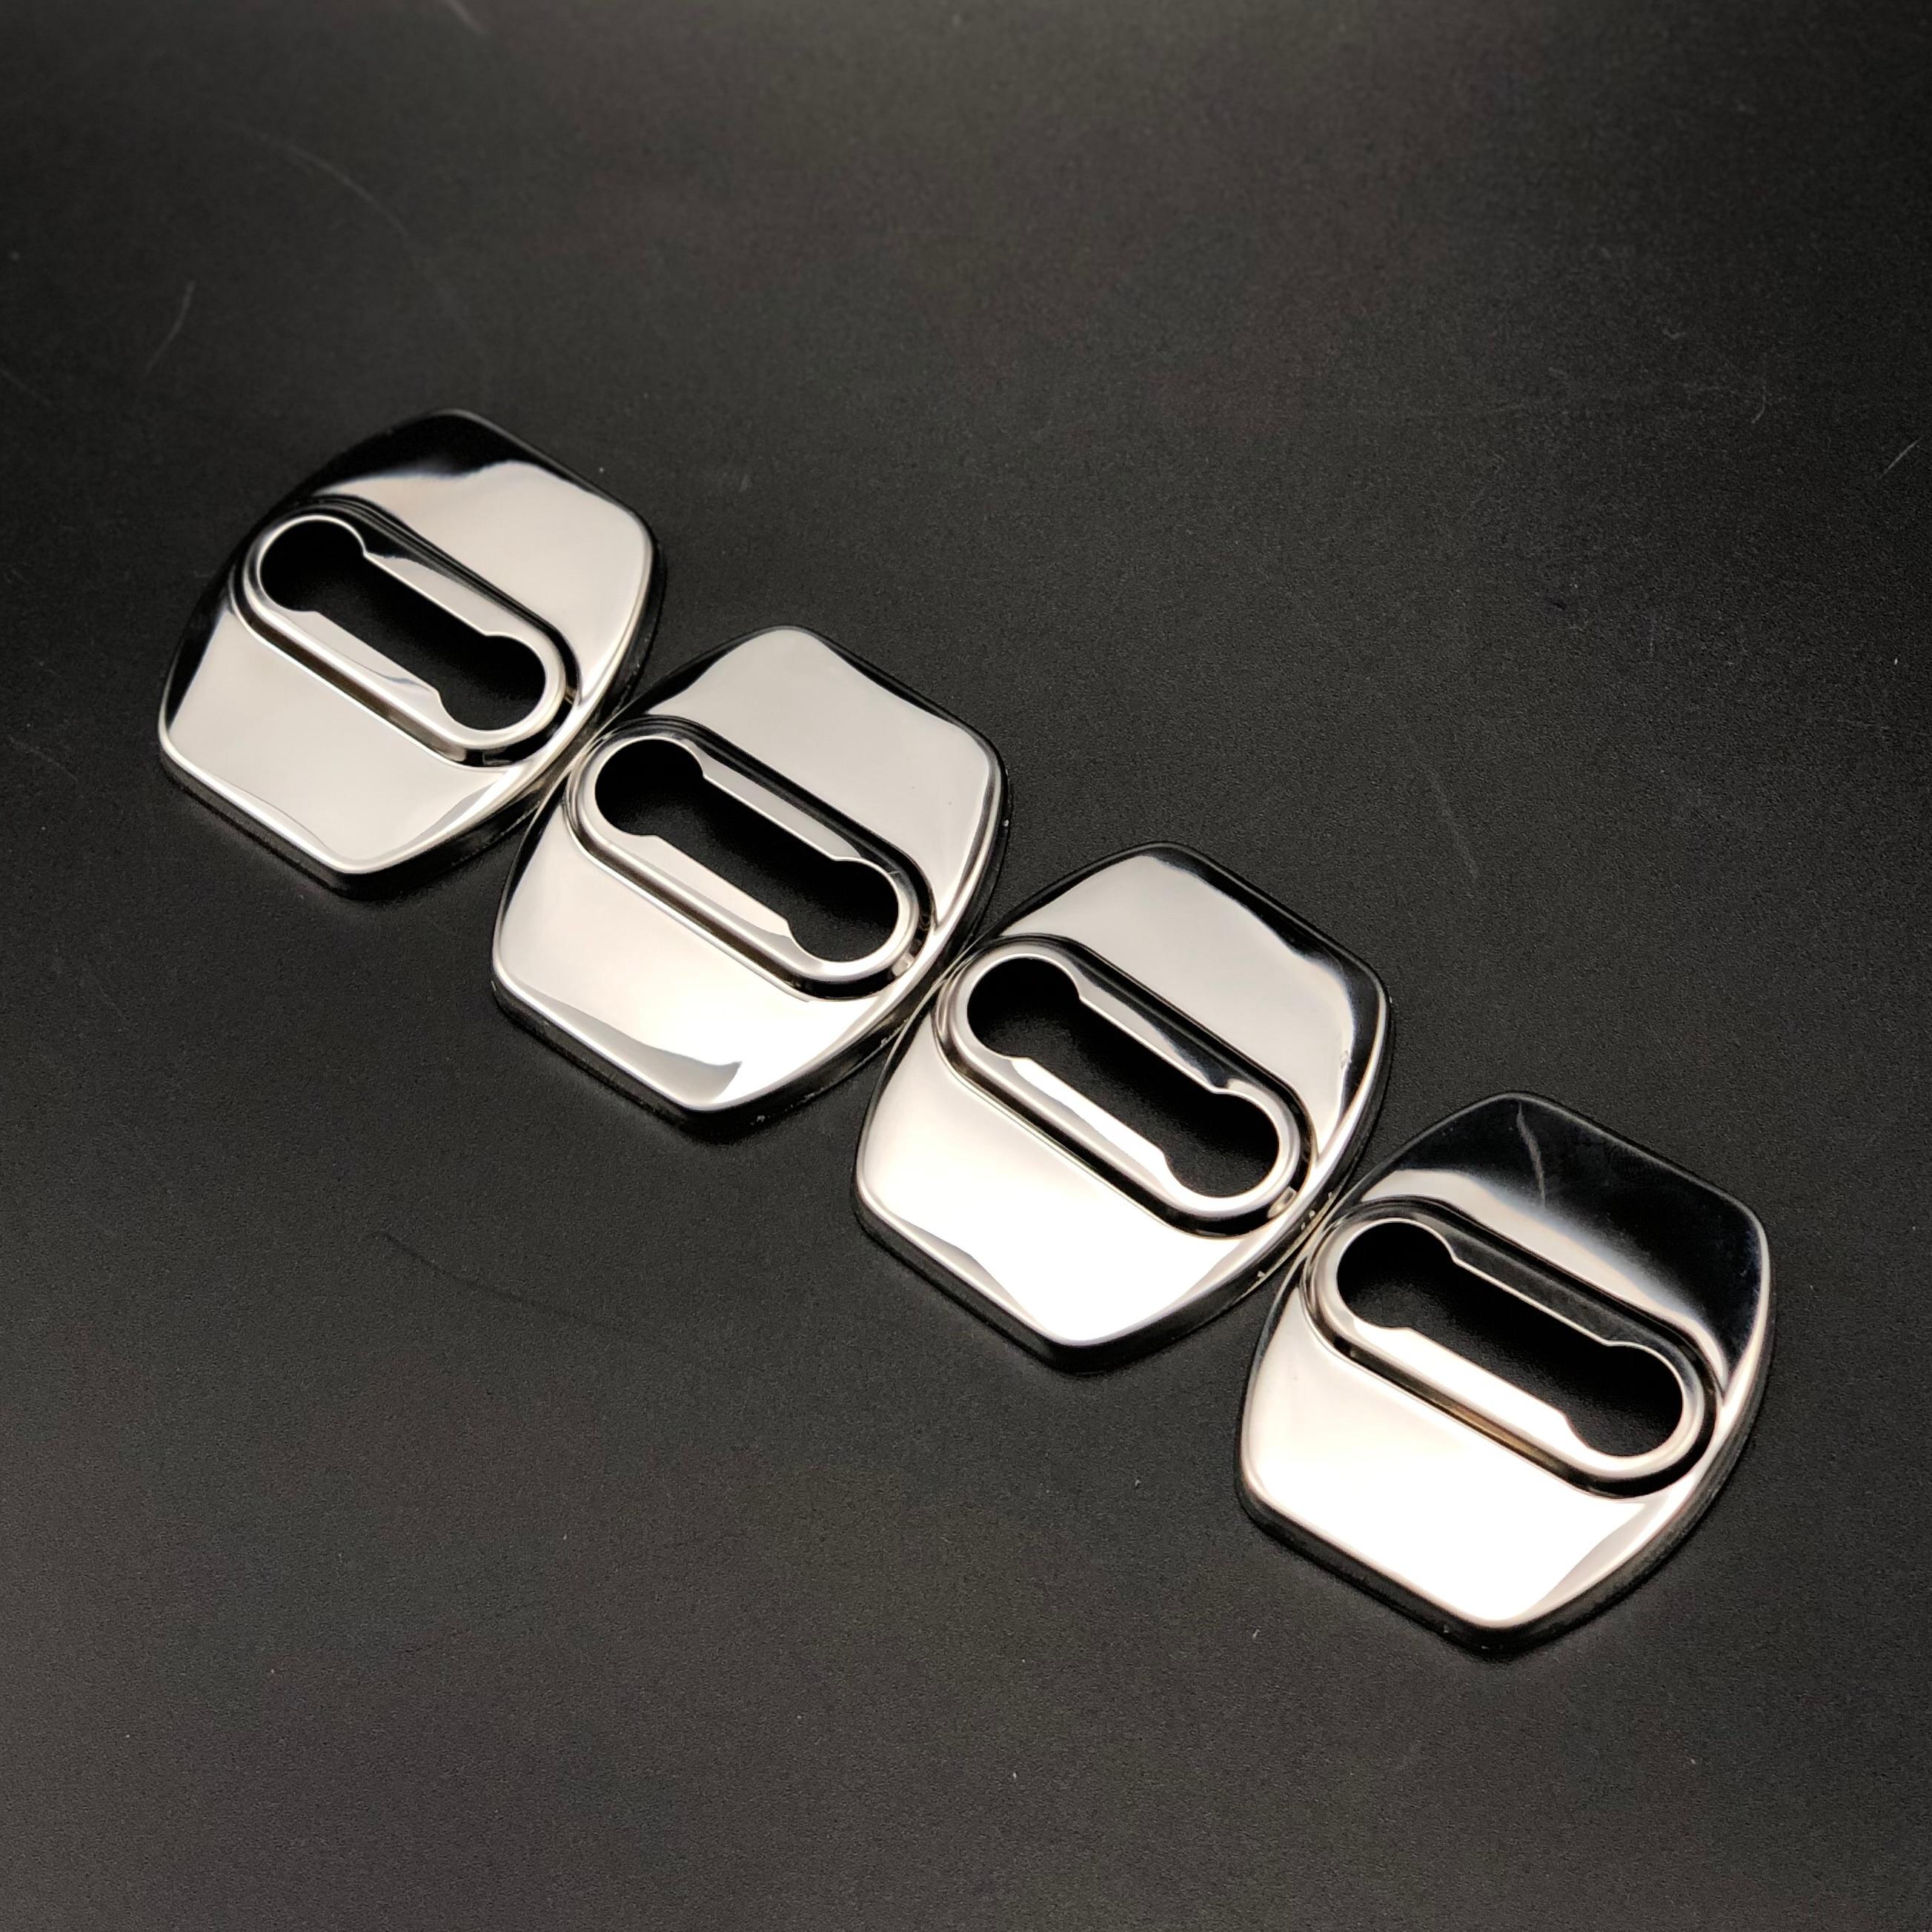 Auto styling Zubehör Türschloss Abdeckung Für Hyundai ENCINO KONA SantaFe Veracruz Mistra Tucson Veloster Rohens AZERA Avante